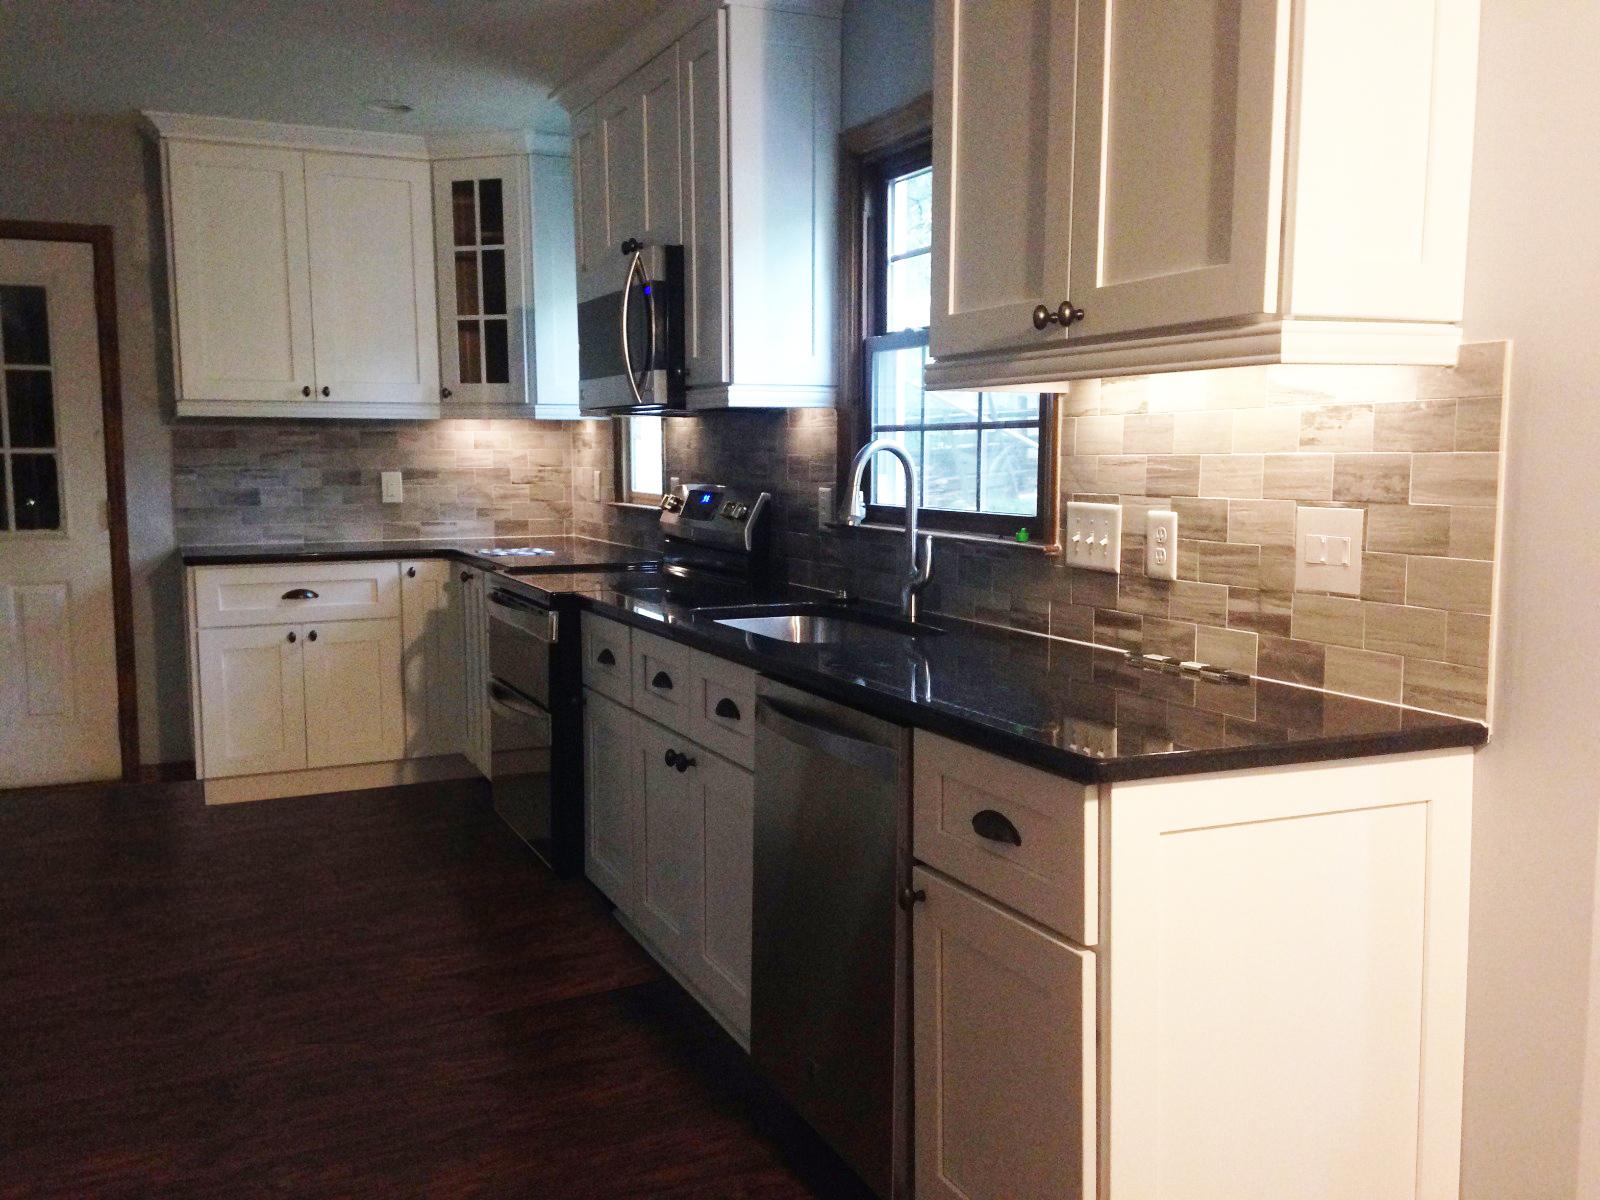 Lennox Shaker White kitchen in Huntersville, NC.